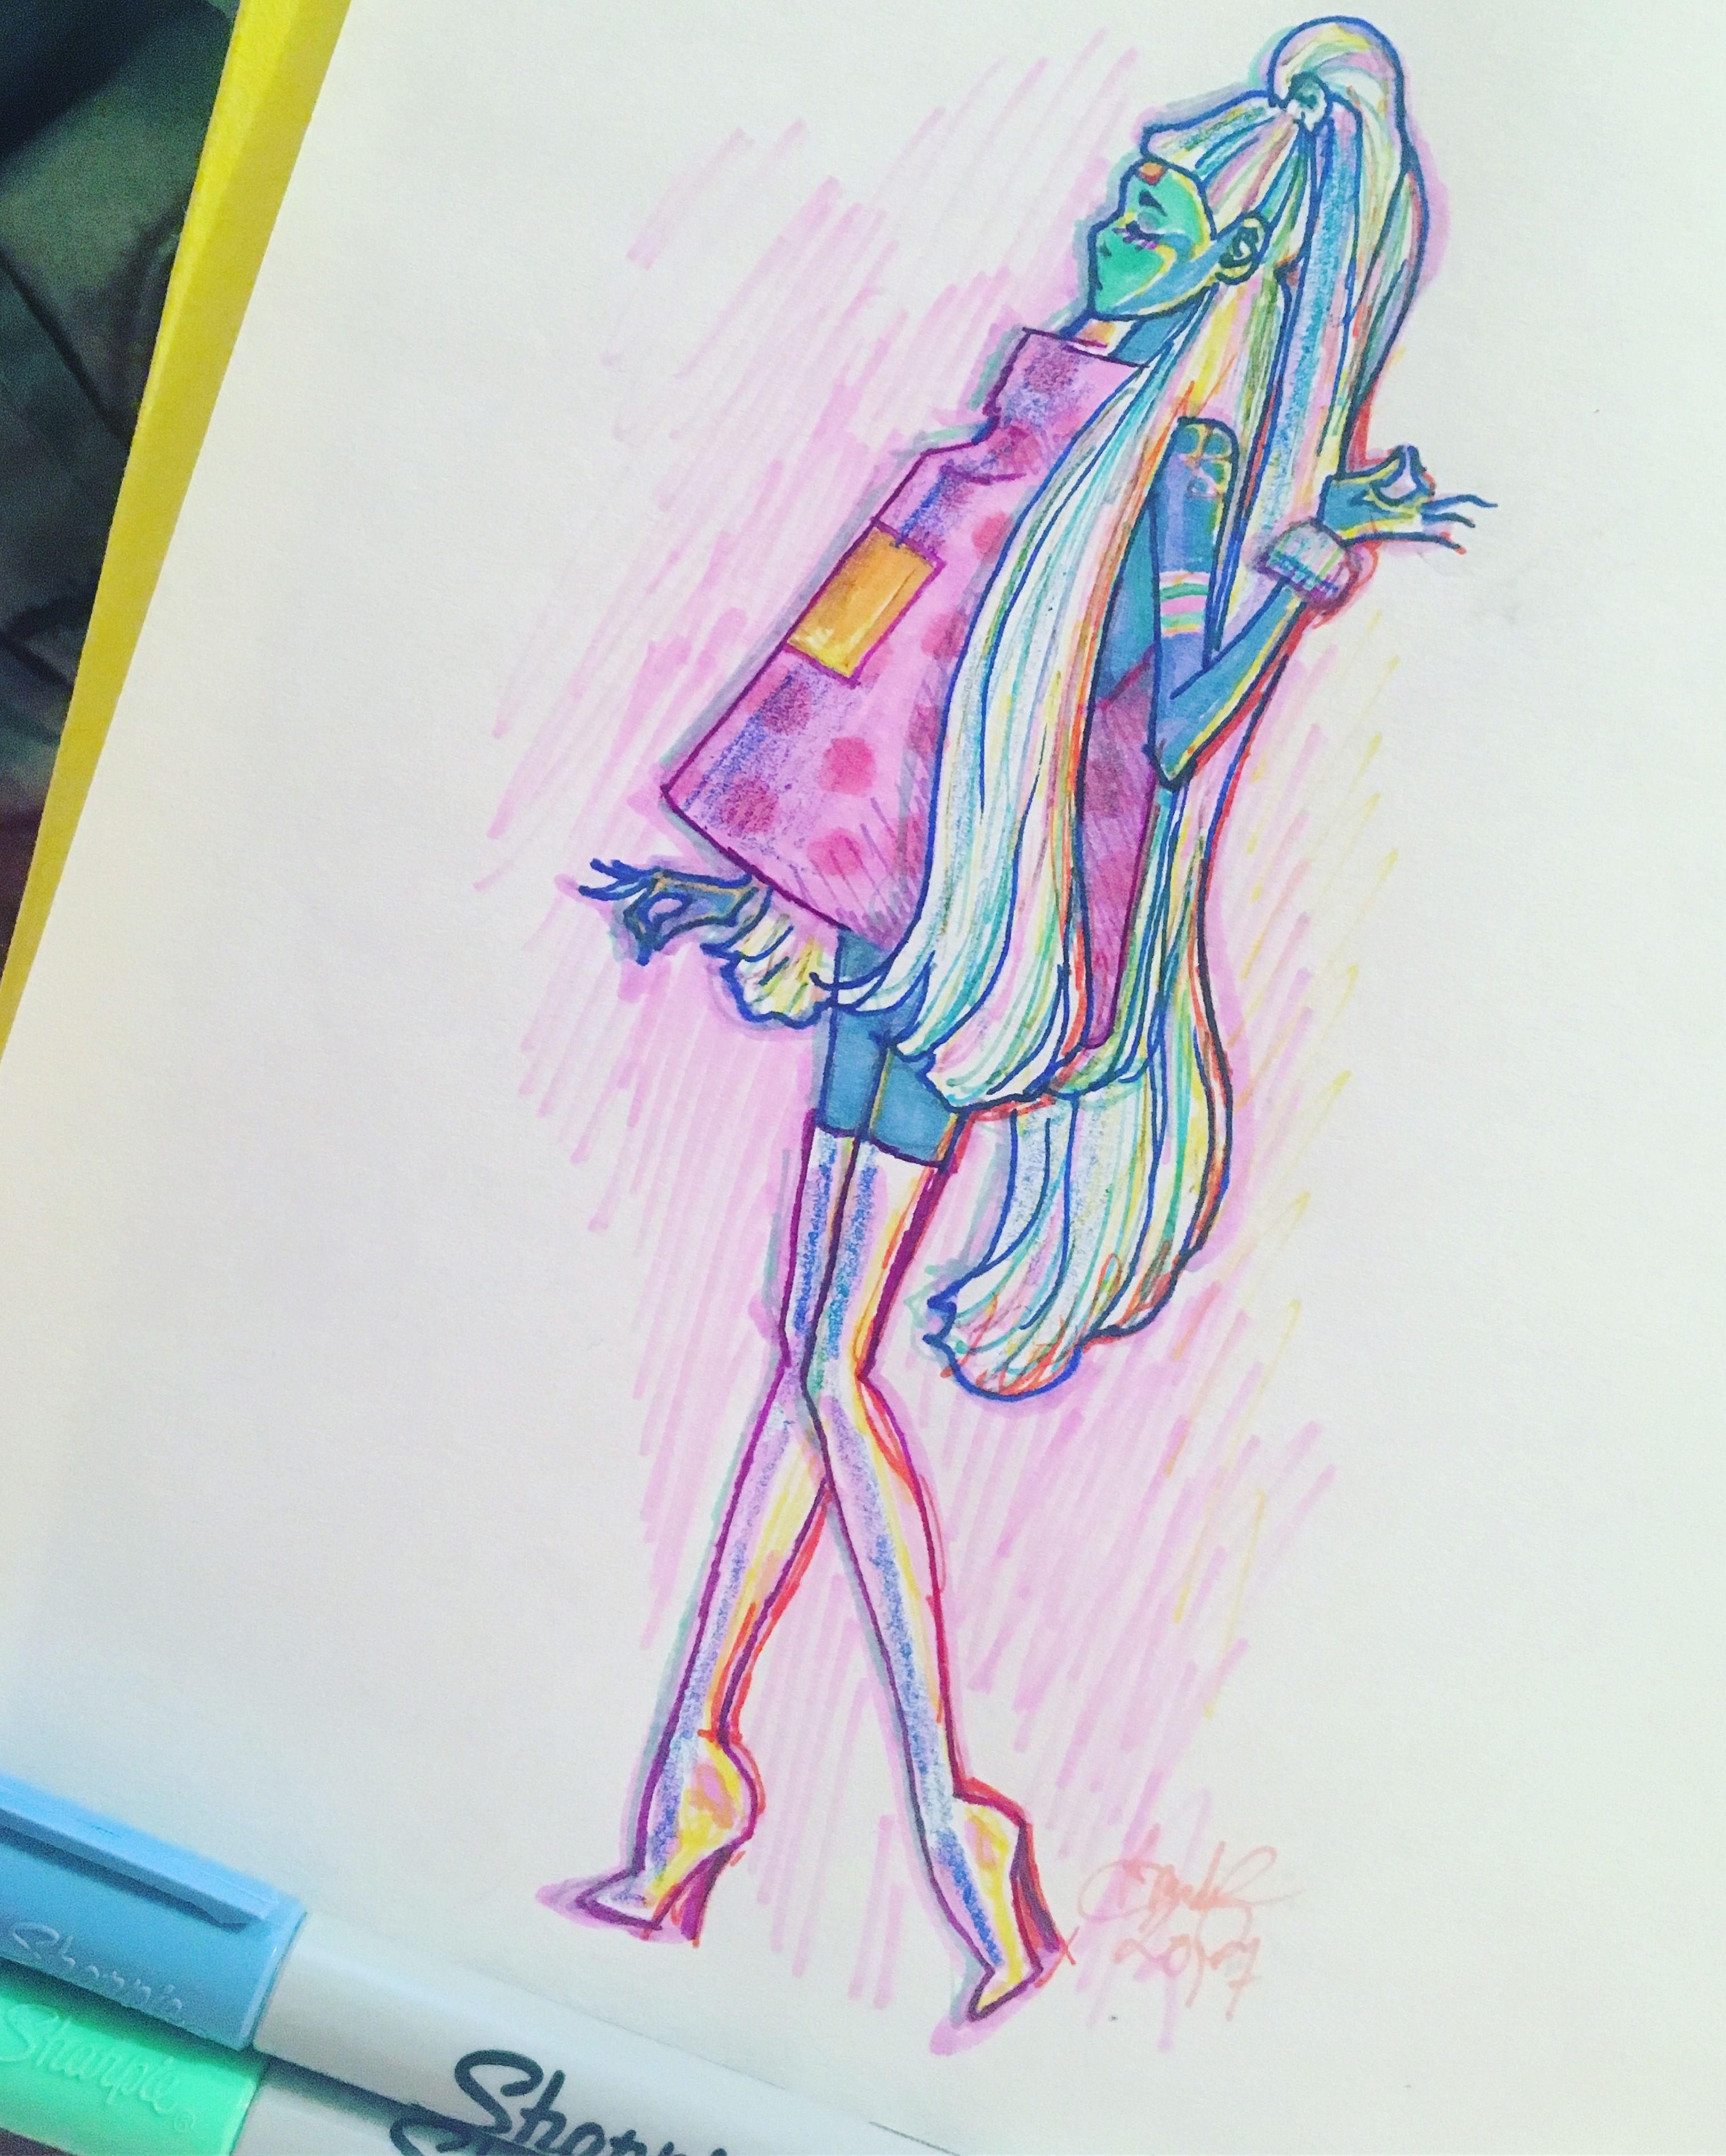 Drawing Art Doodle Sketch Figuredrawing Illustration Cartoon Fineart Vaporwave Pastel Fashion Art Drawings Painting